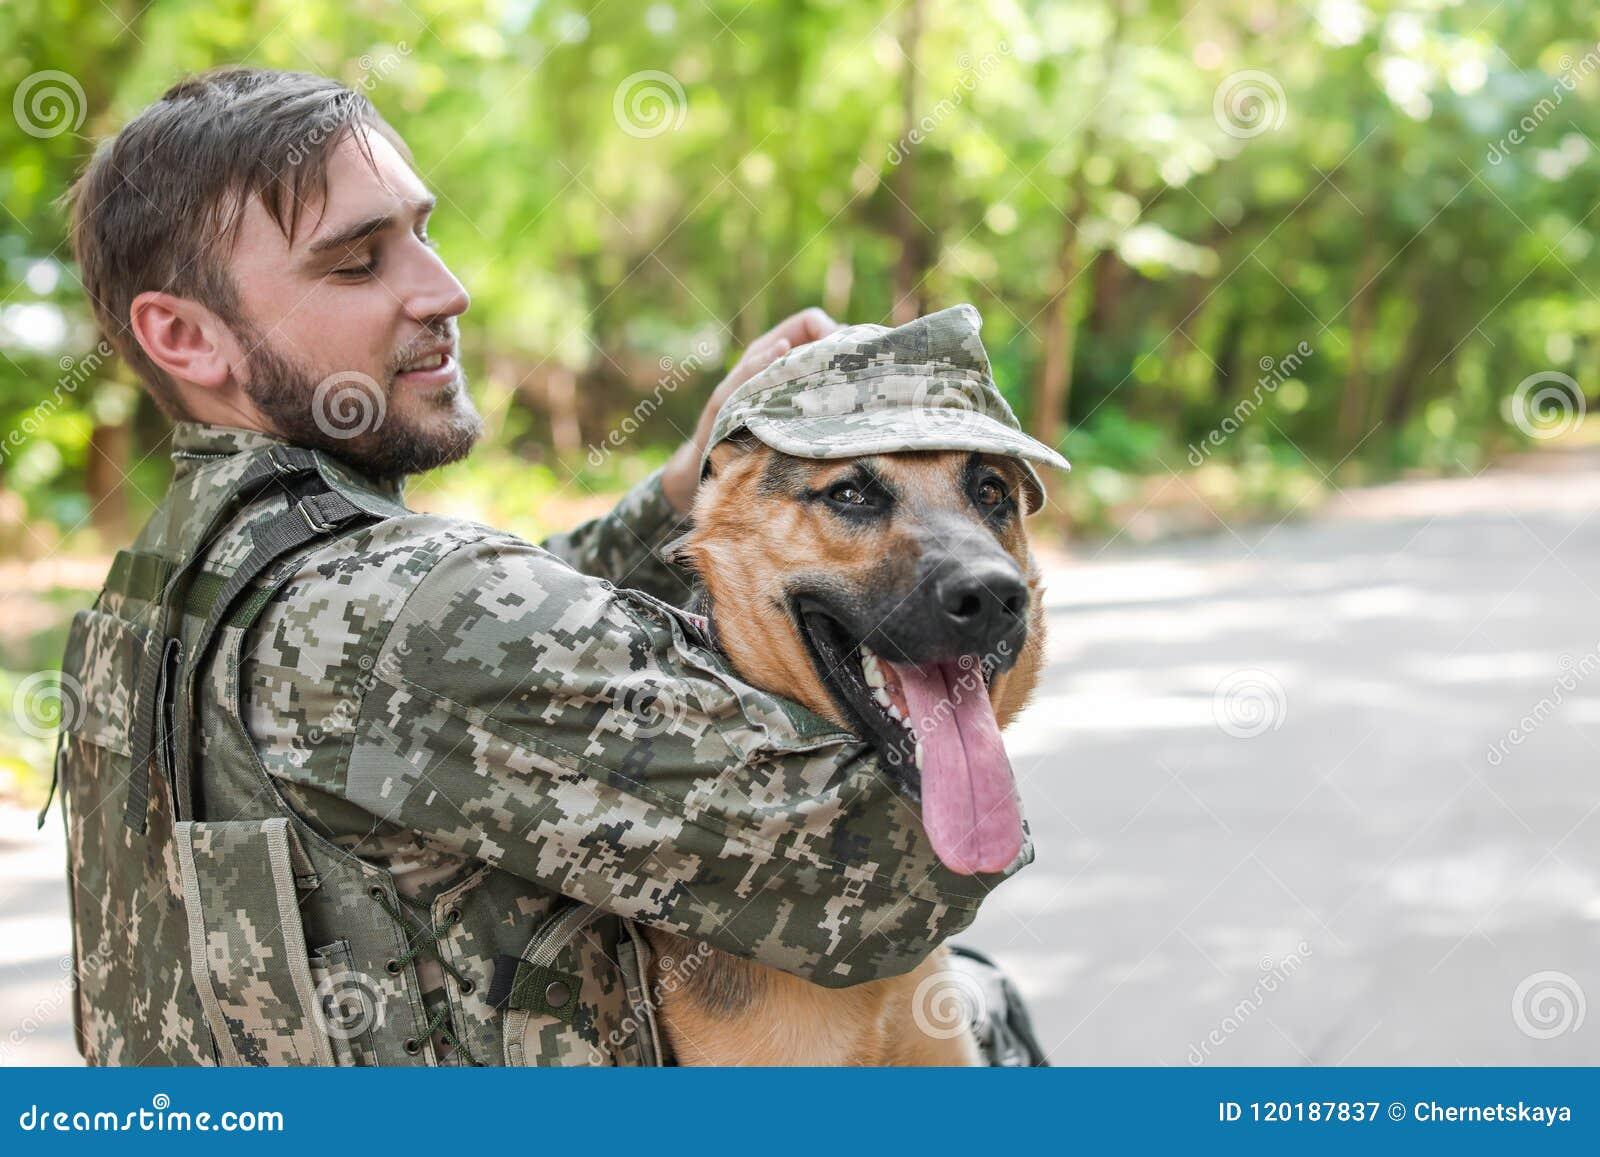 Man in military uniform with German shepherd dog